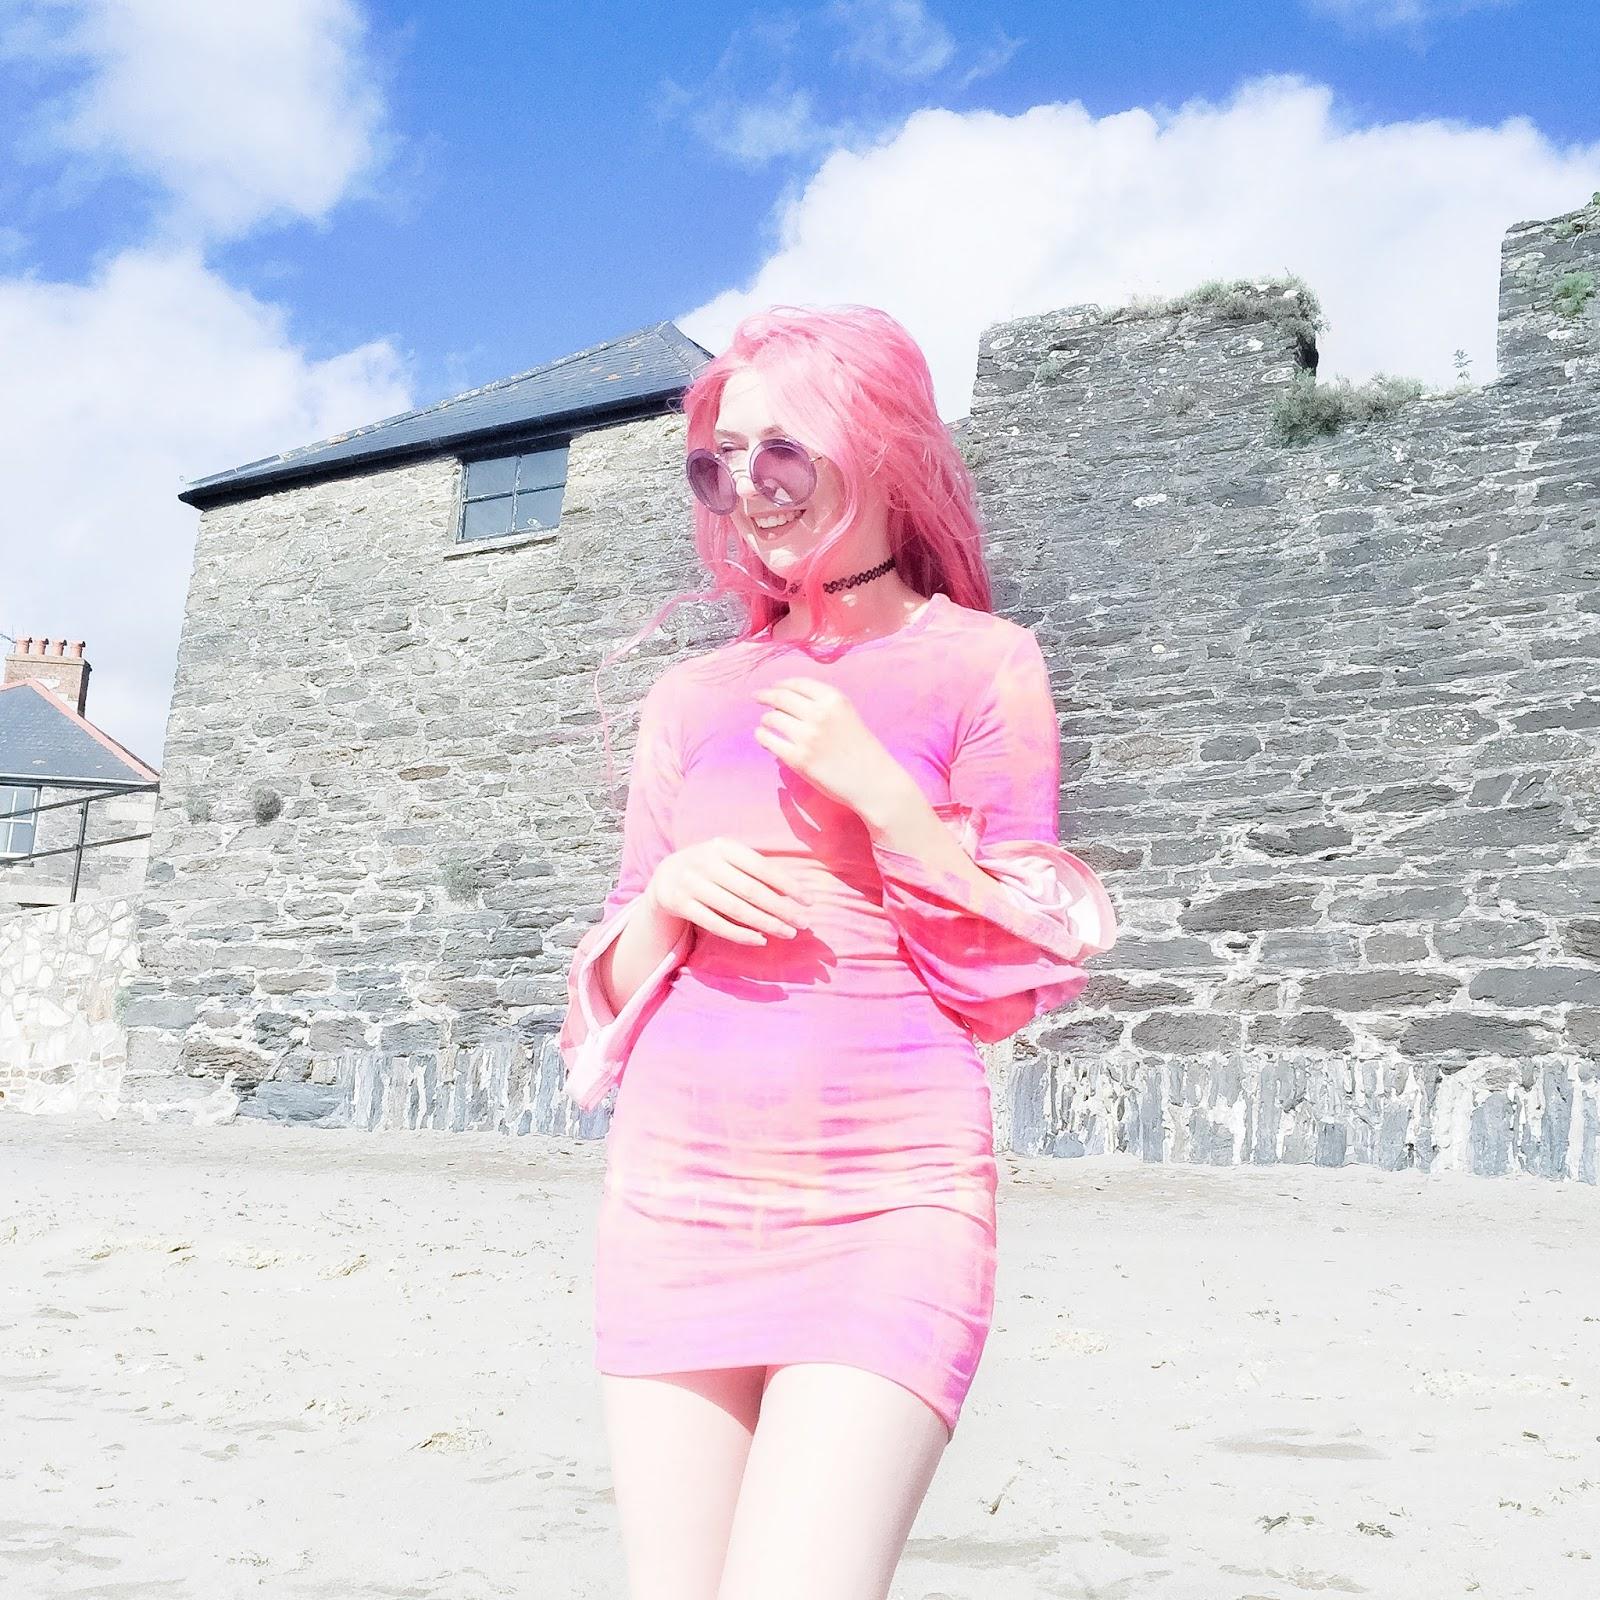 TIE DYE ON THE BEACH